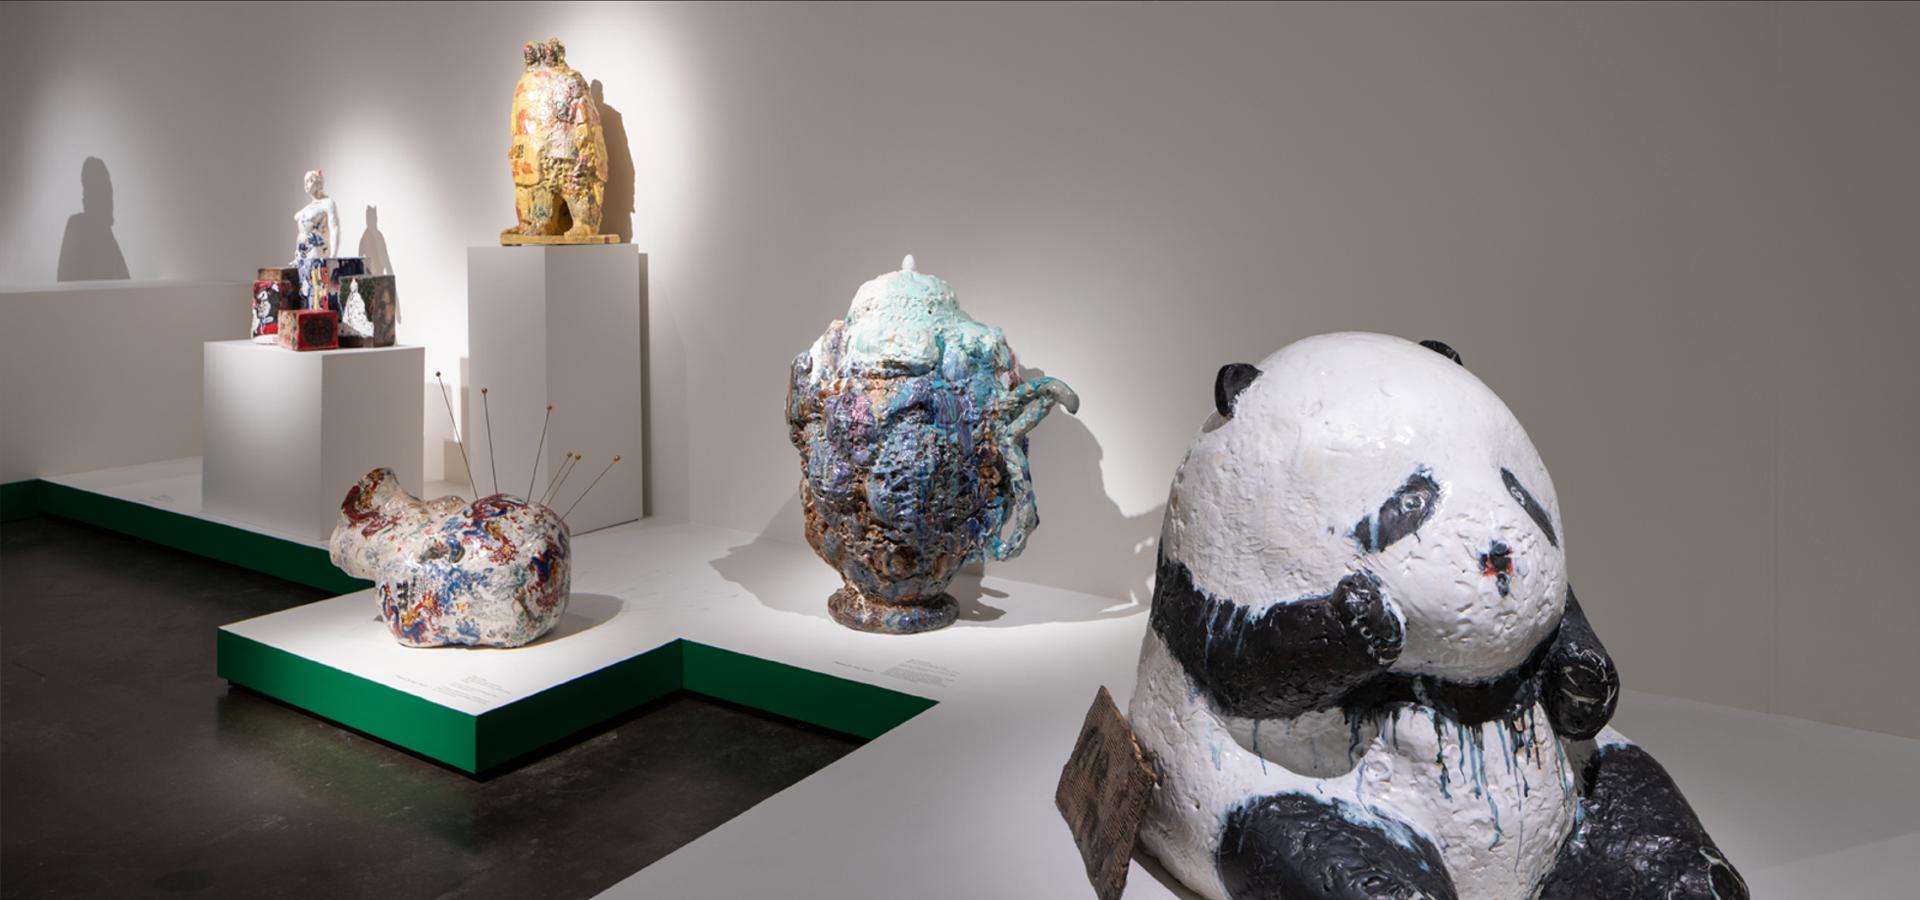 Ceramic sculptures by Wanxin Zhang in Museum of Craft of Design galleries